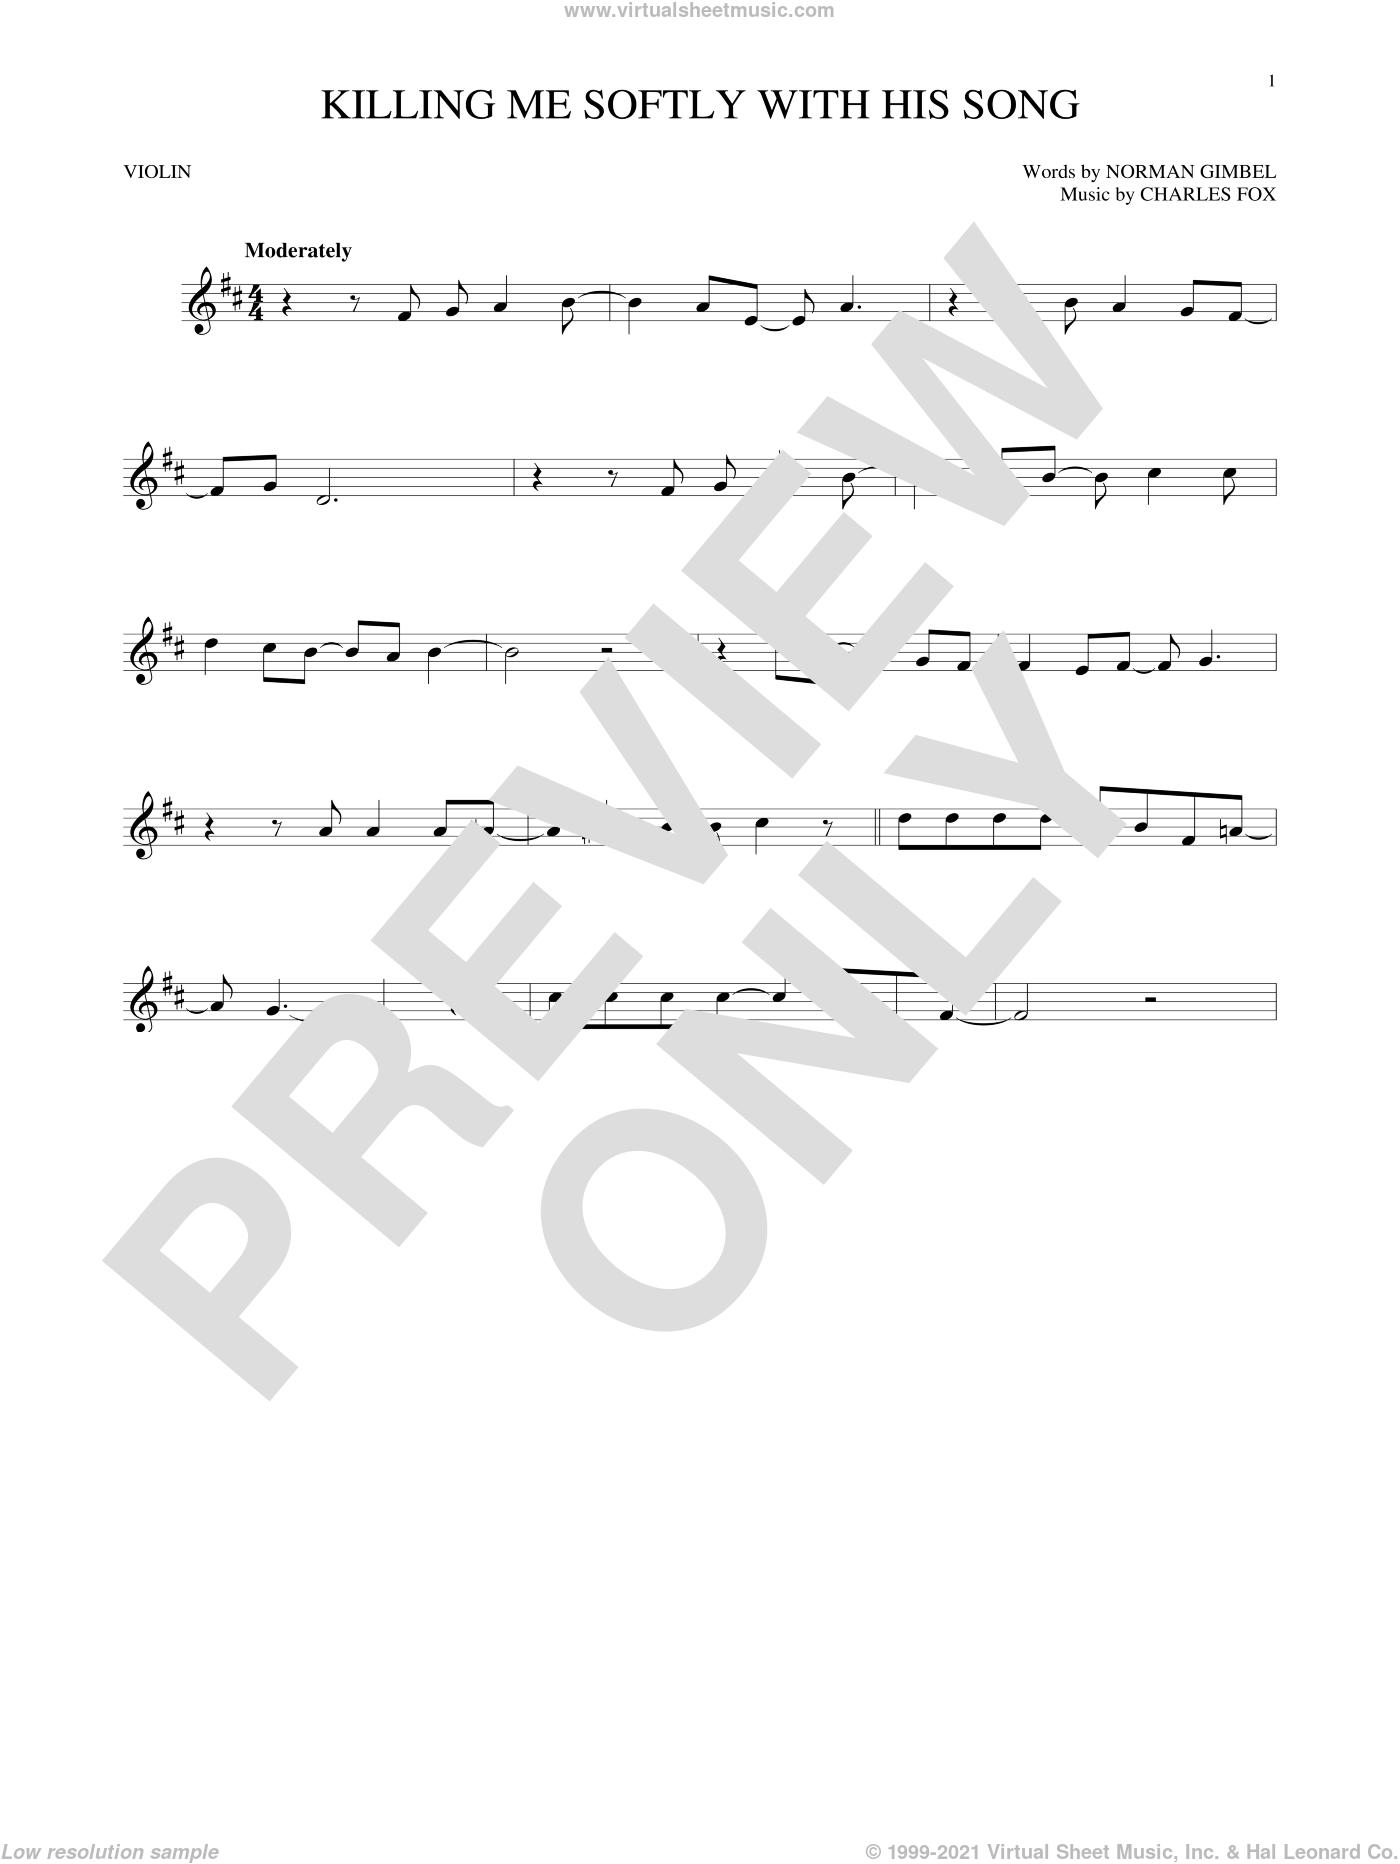 Killing Me Softly With His Song sheet music for viola solo (violin) by Roberta Flack, Charles Fox and Norman Gimbel, intermediate viola (violin)